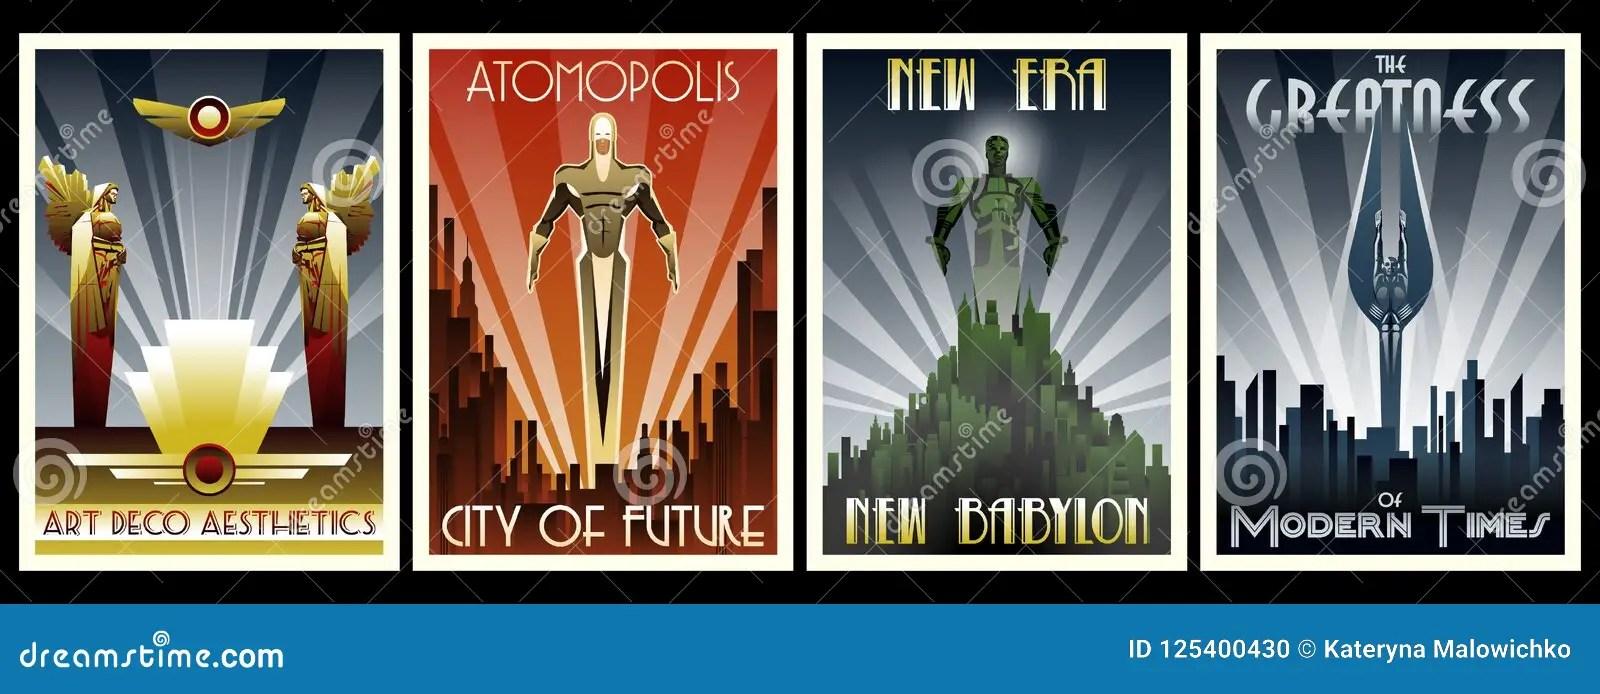 https www dreamstime com art deco style poster set vector aeshttics sculptures roaring twenties image125400430